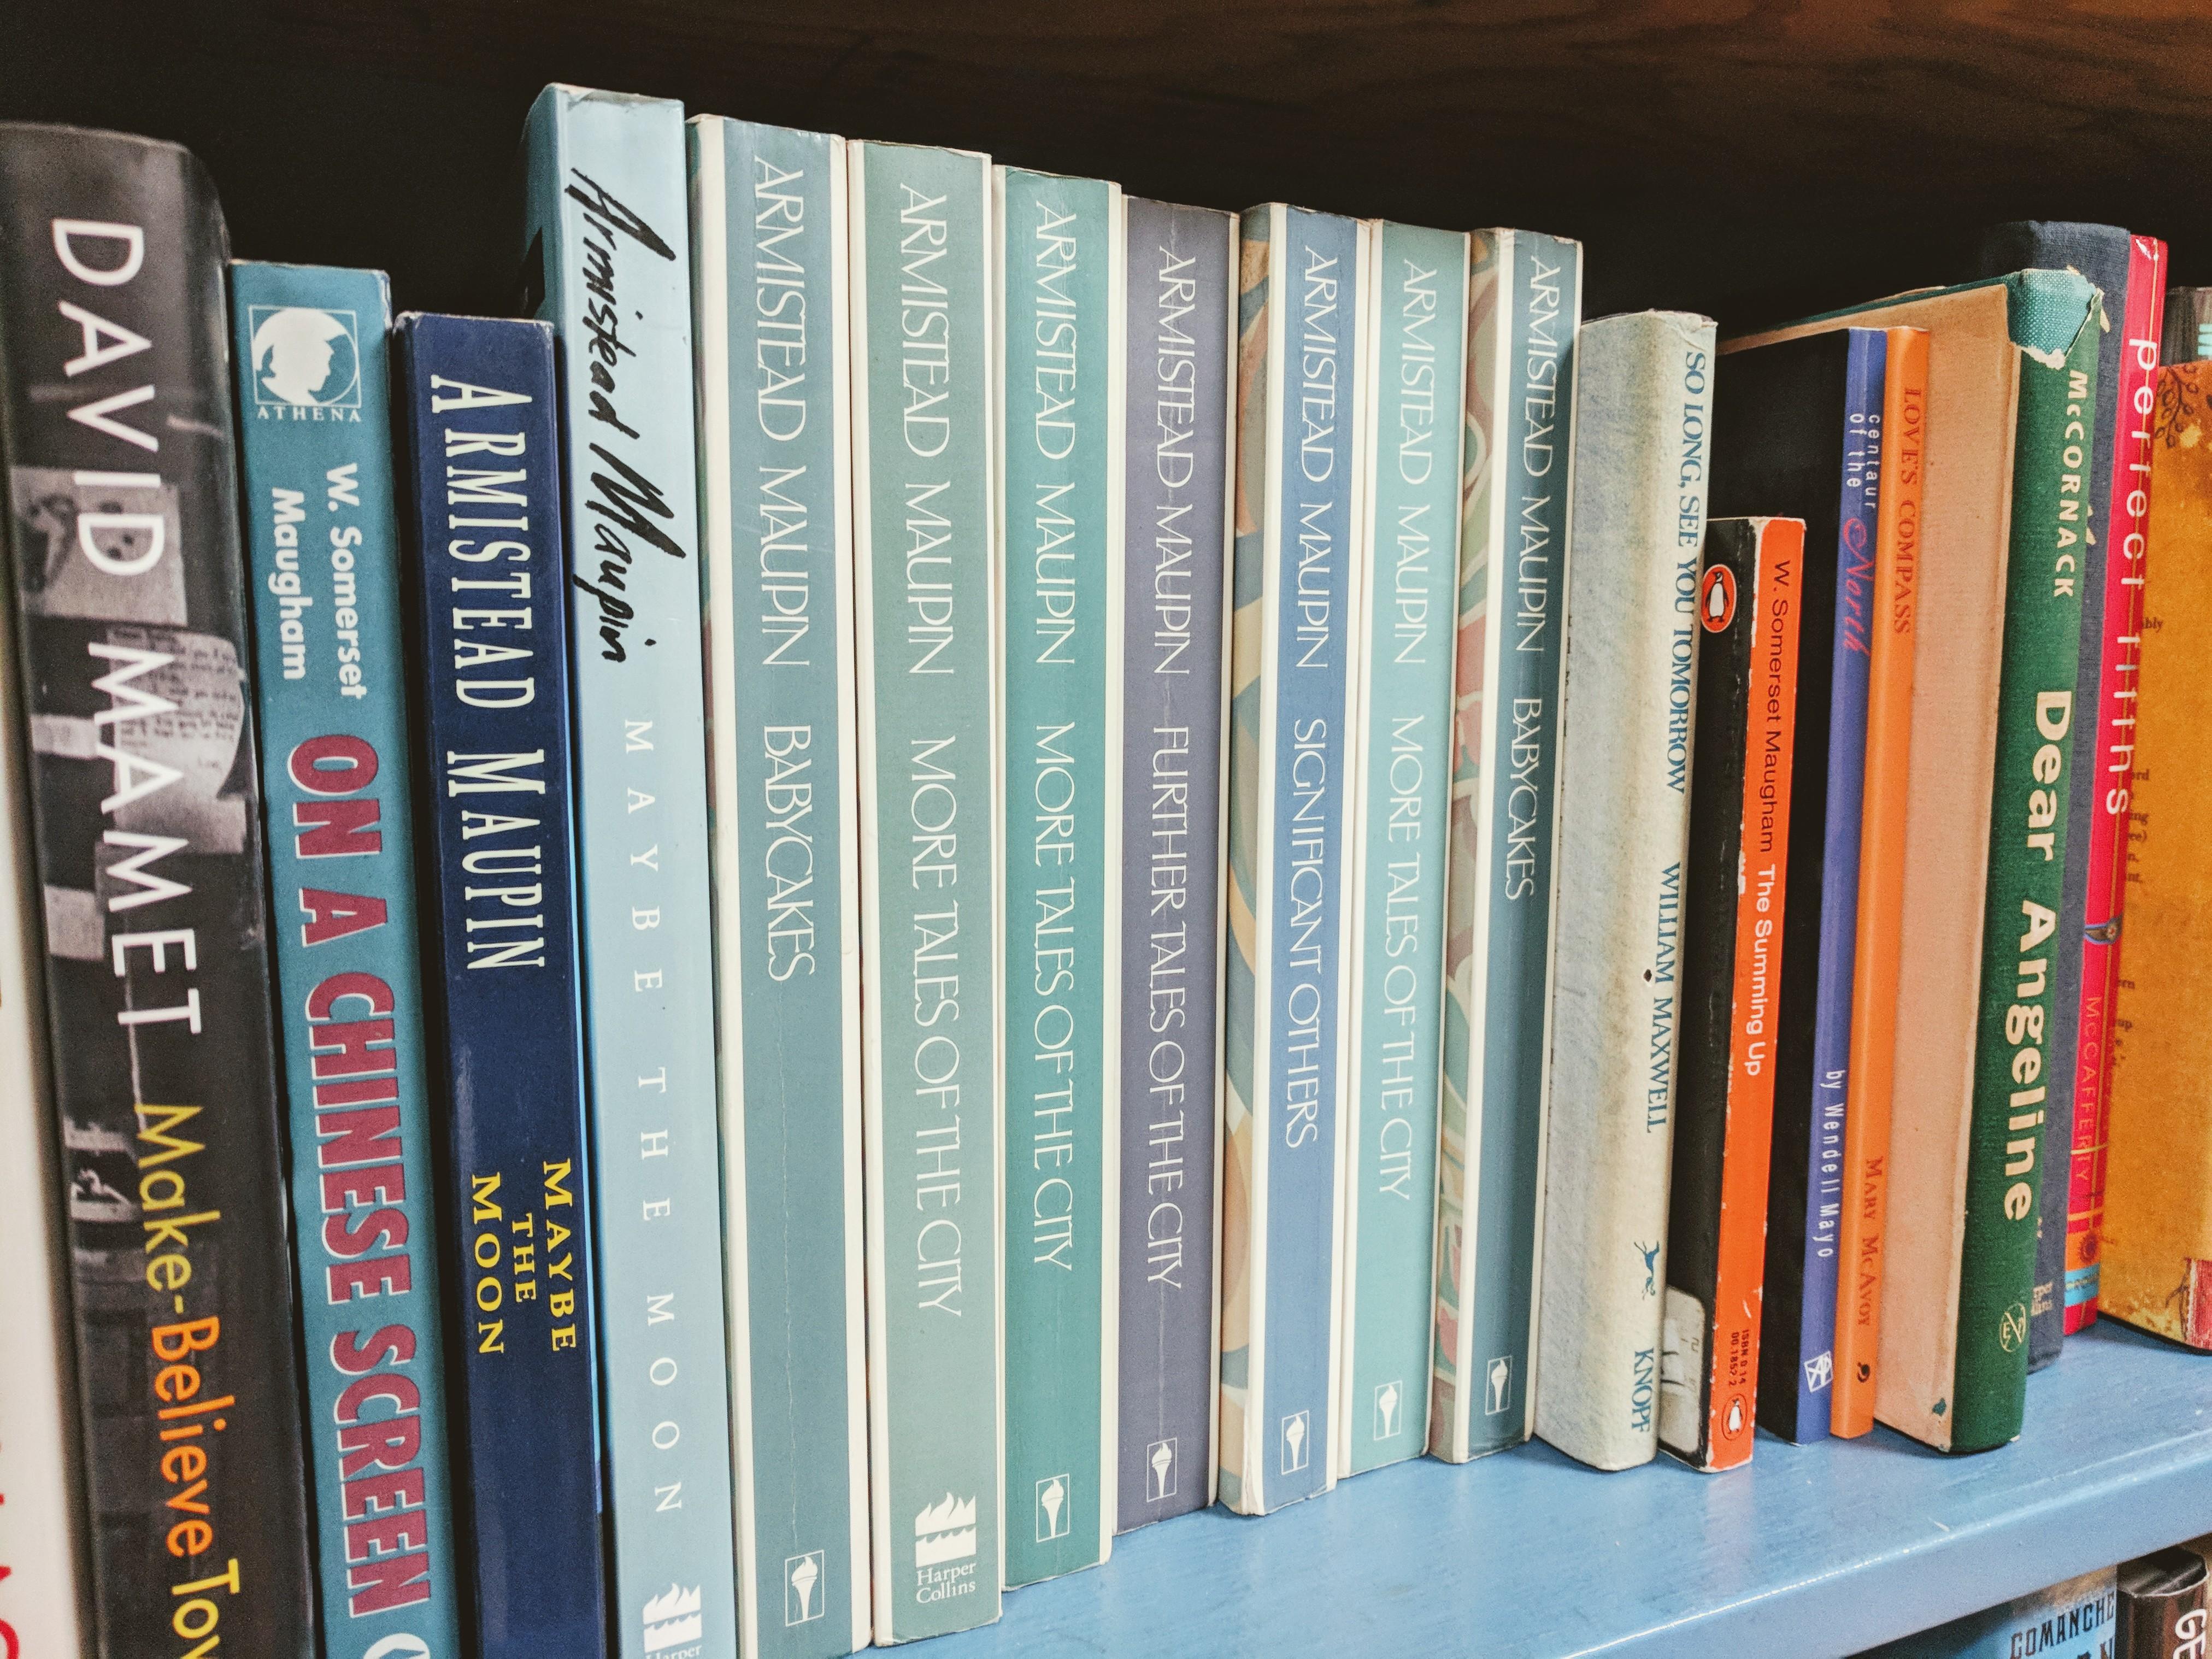 Armistead Maupin anyone _detail from M shelf at Dogtown Book shop Gloucester MA_20181201_©c ryan.jpg